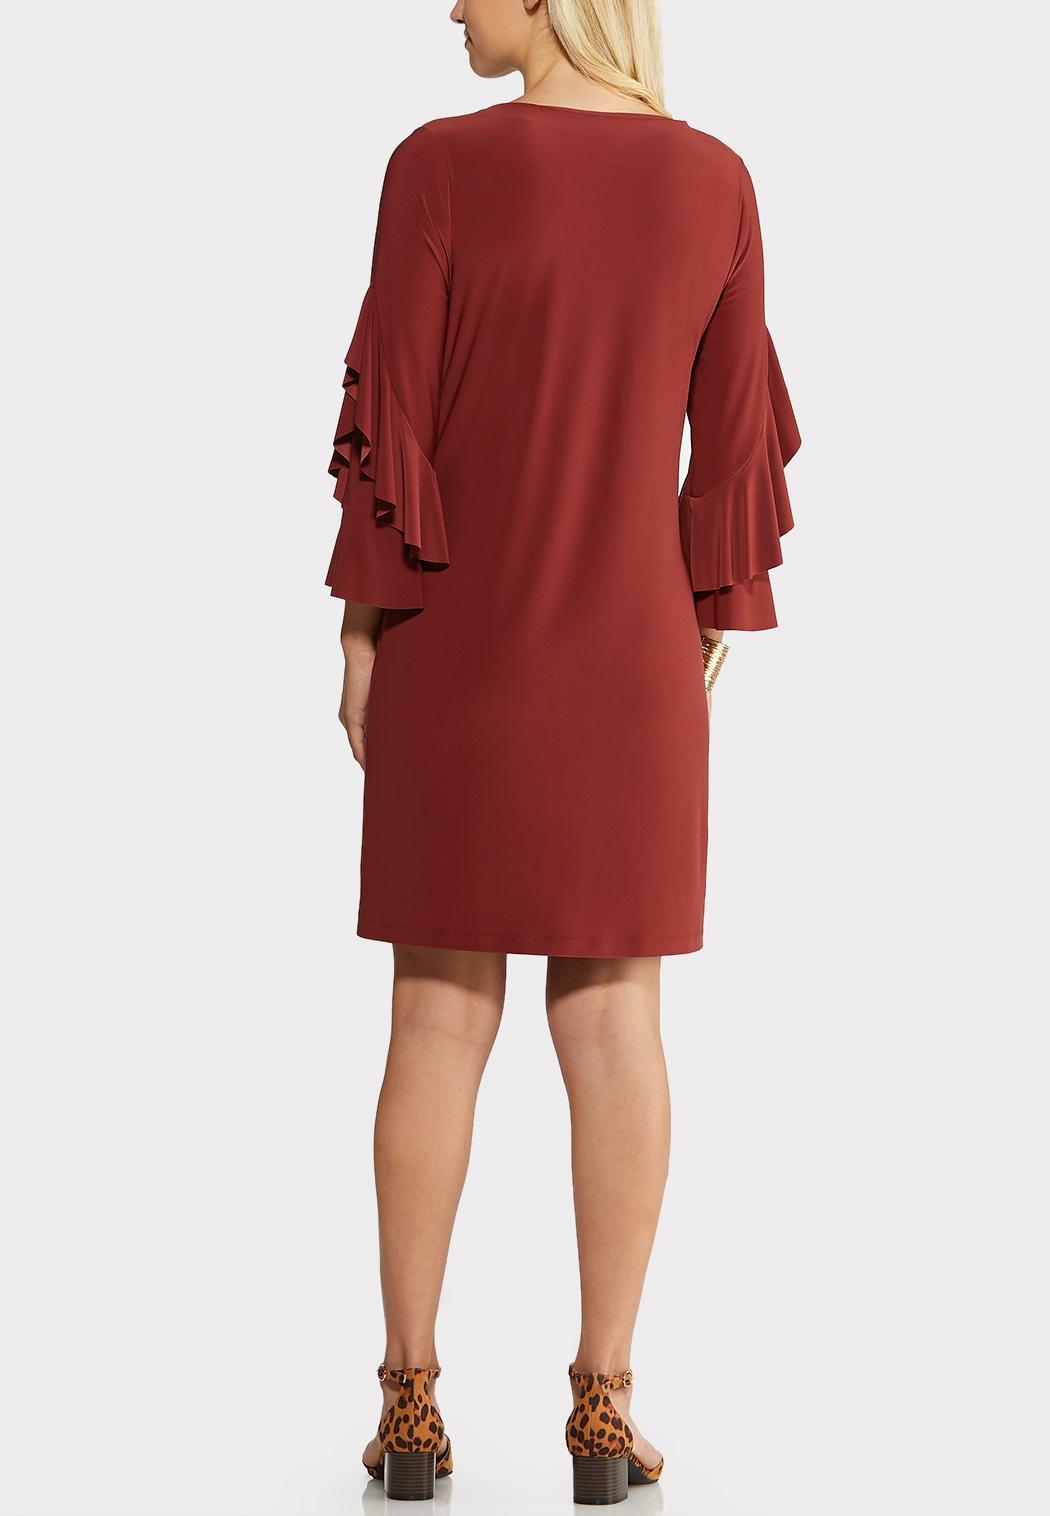 Plus Size Flounce Sleeve Sheath Dress (Item #43989517)